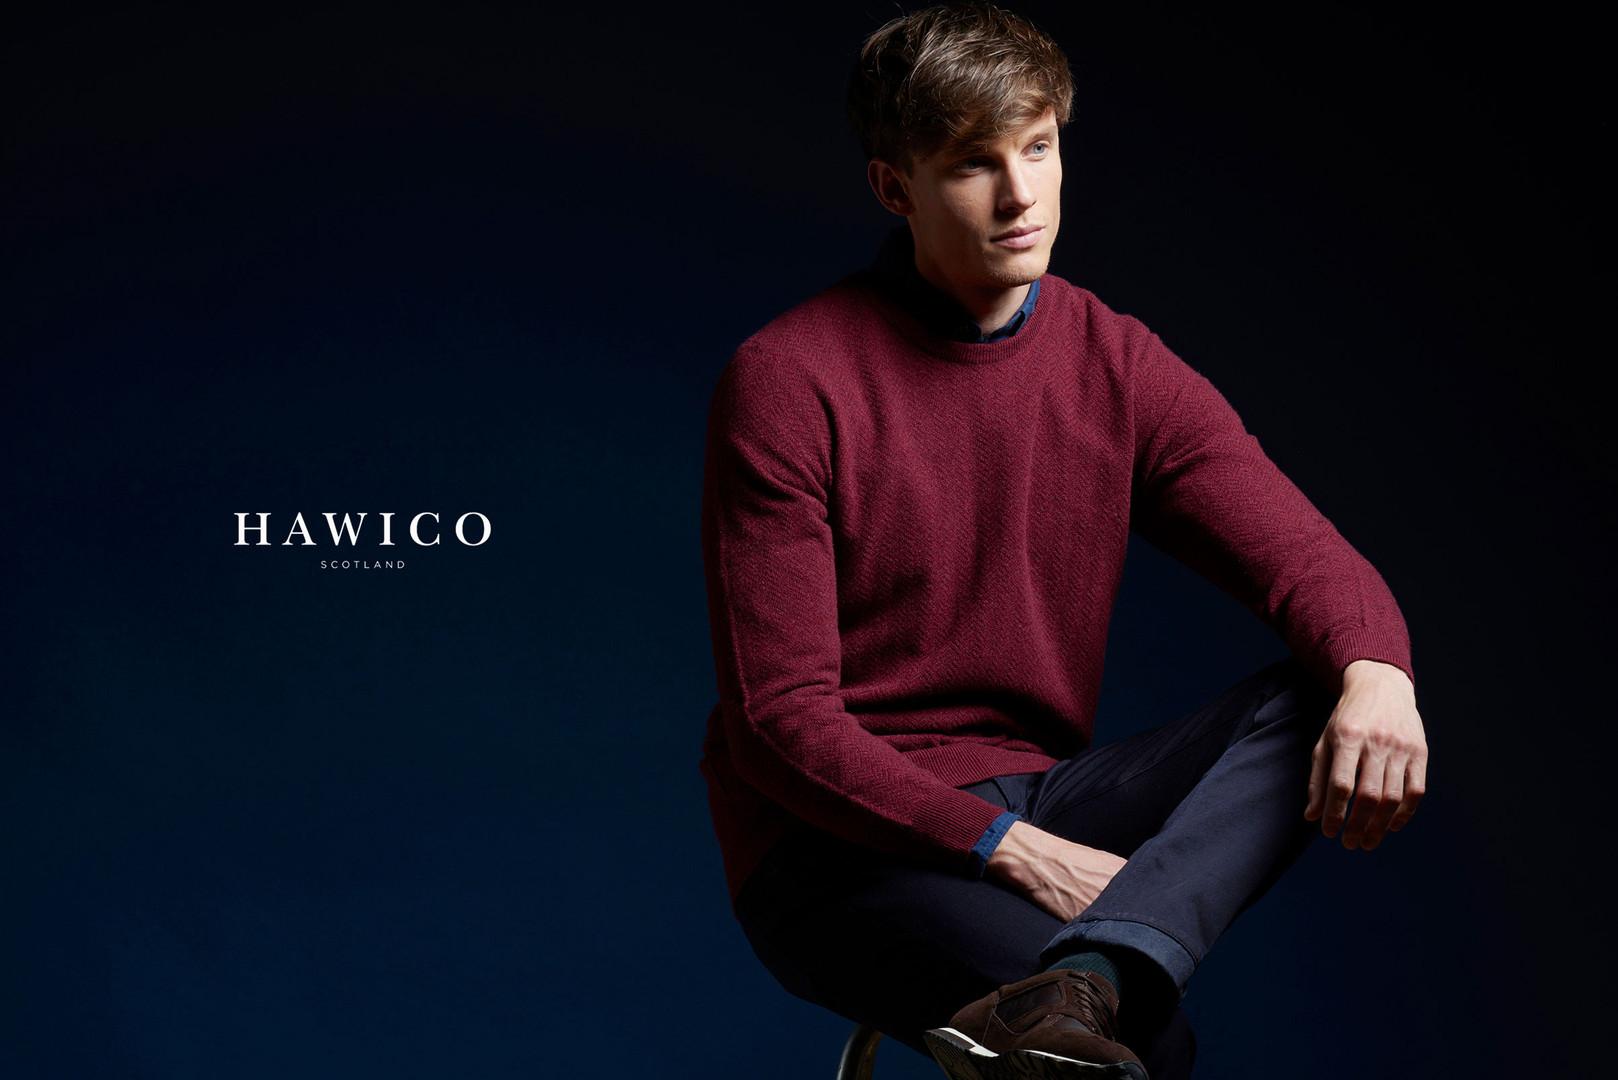 CA_Hawico-AW17-3.jpg